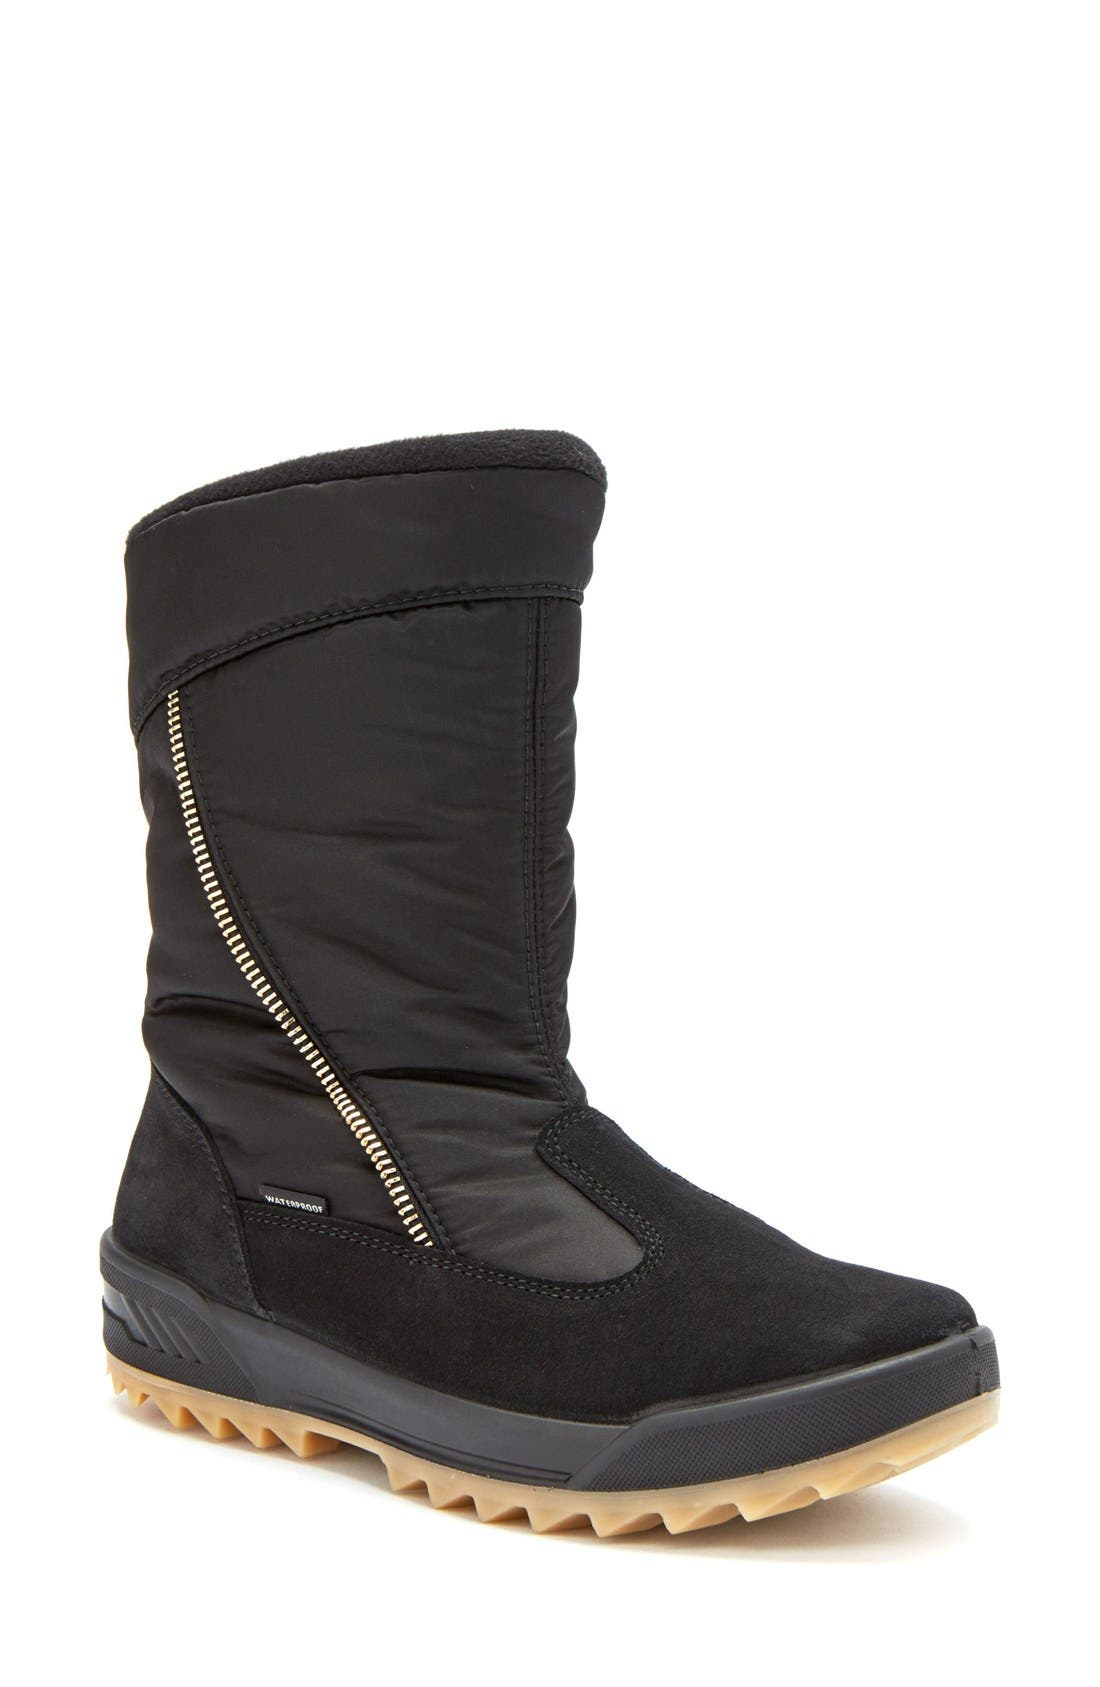 BLONDO Iceland Waterproof Snow Boot